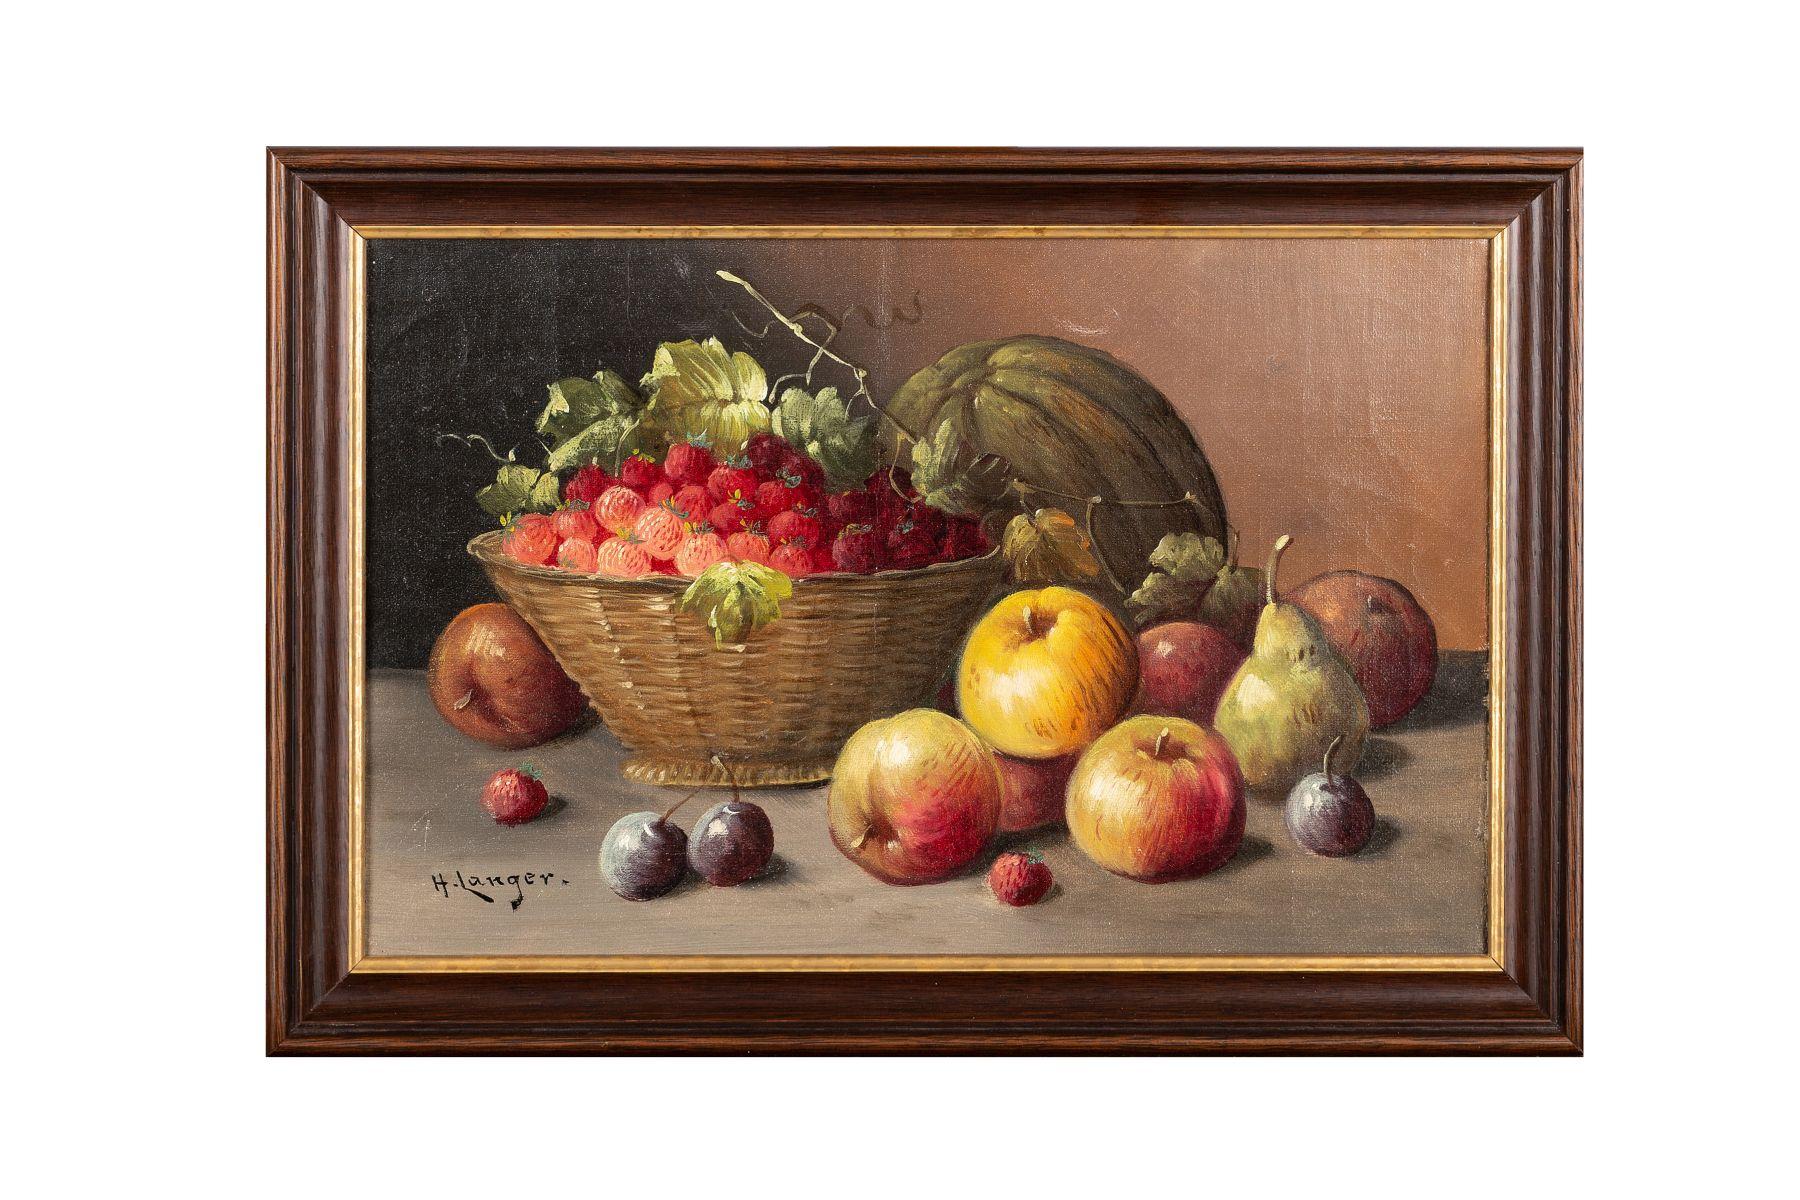 #104 H. Langer, Fruit Still Life, Around 1900 | H. Langer, Früchtestillleben, um 1900 Image